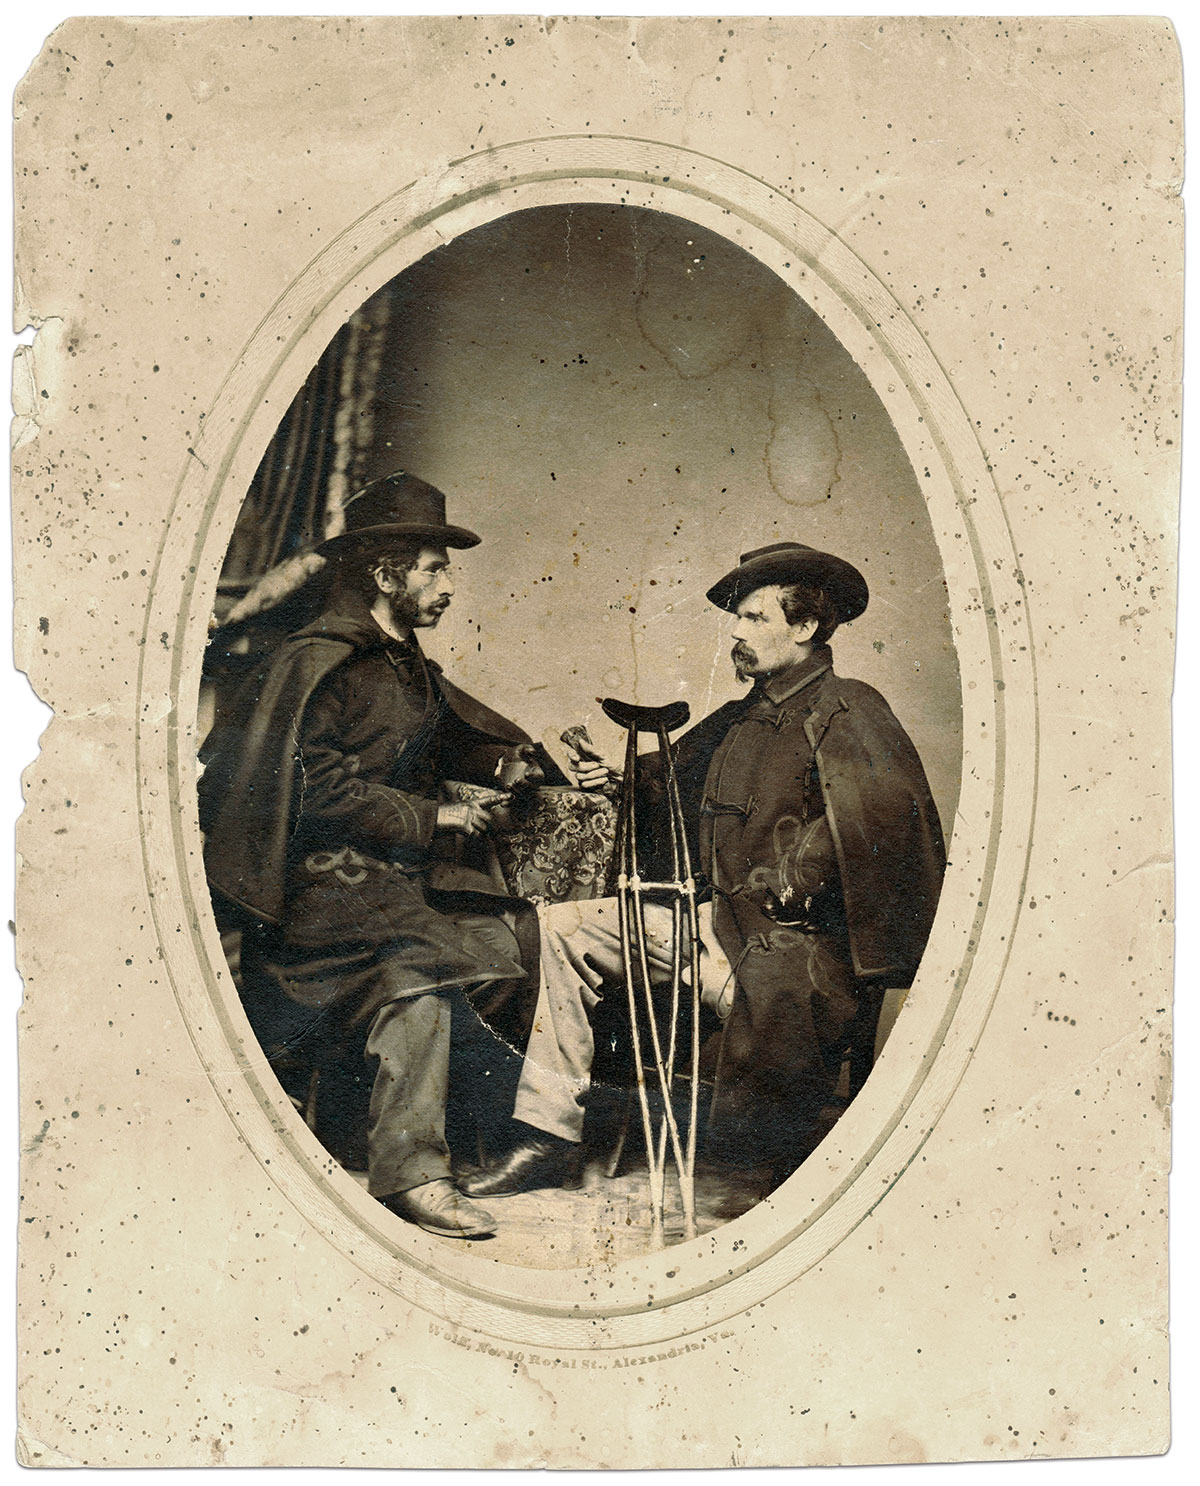 Albumen photograph by Wolff of Alexandria, Va. Seward Osborne Collection.